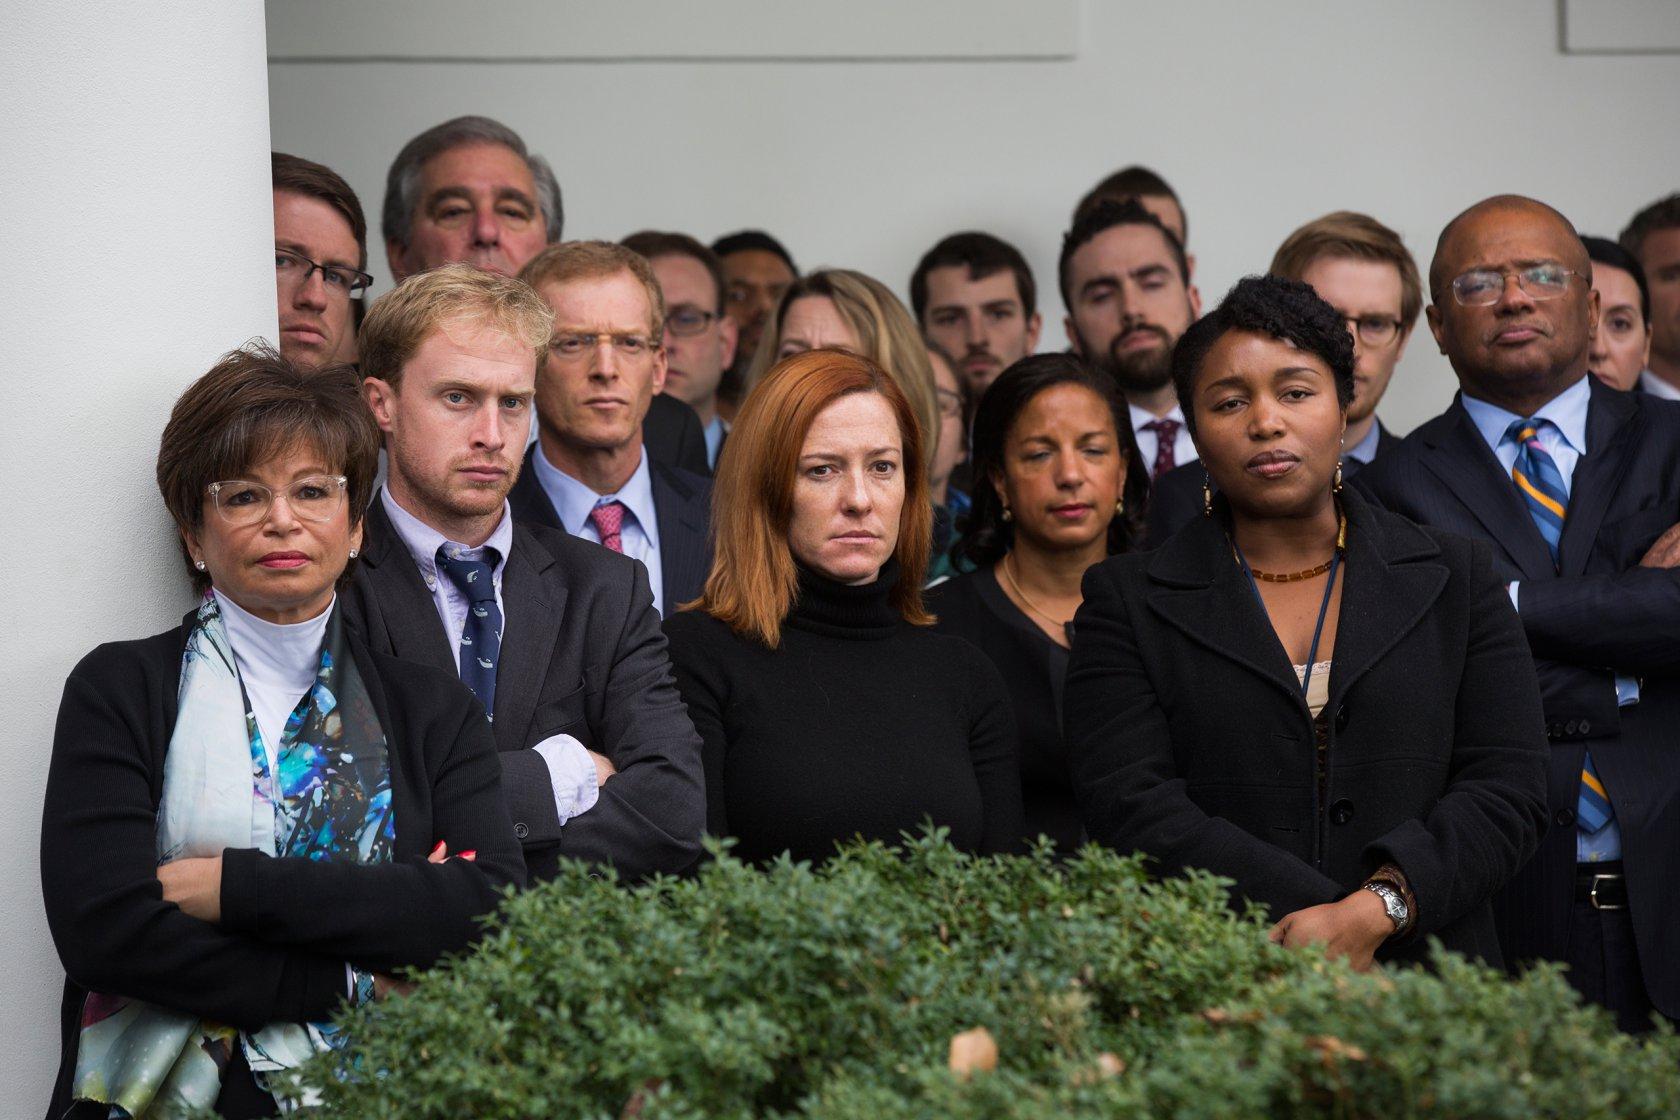 white-house-staff-obama-speech